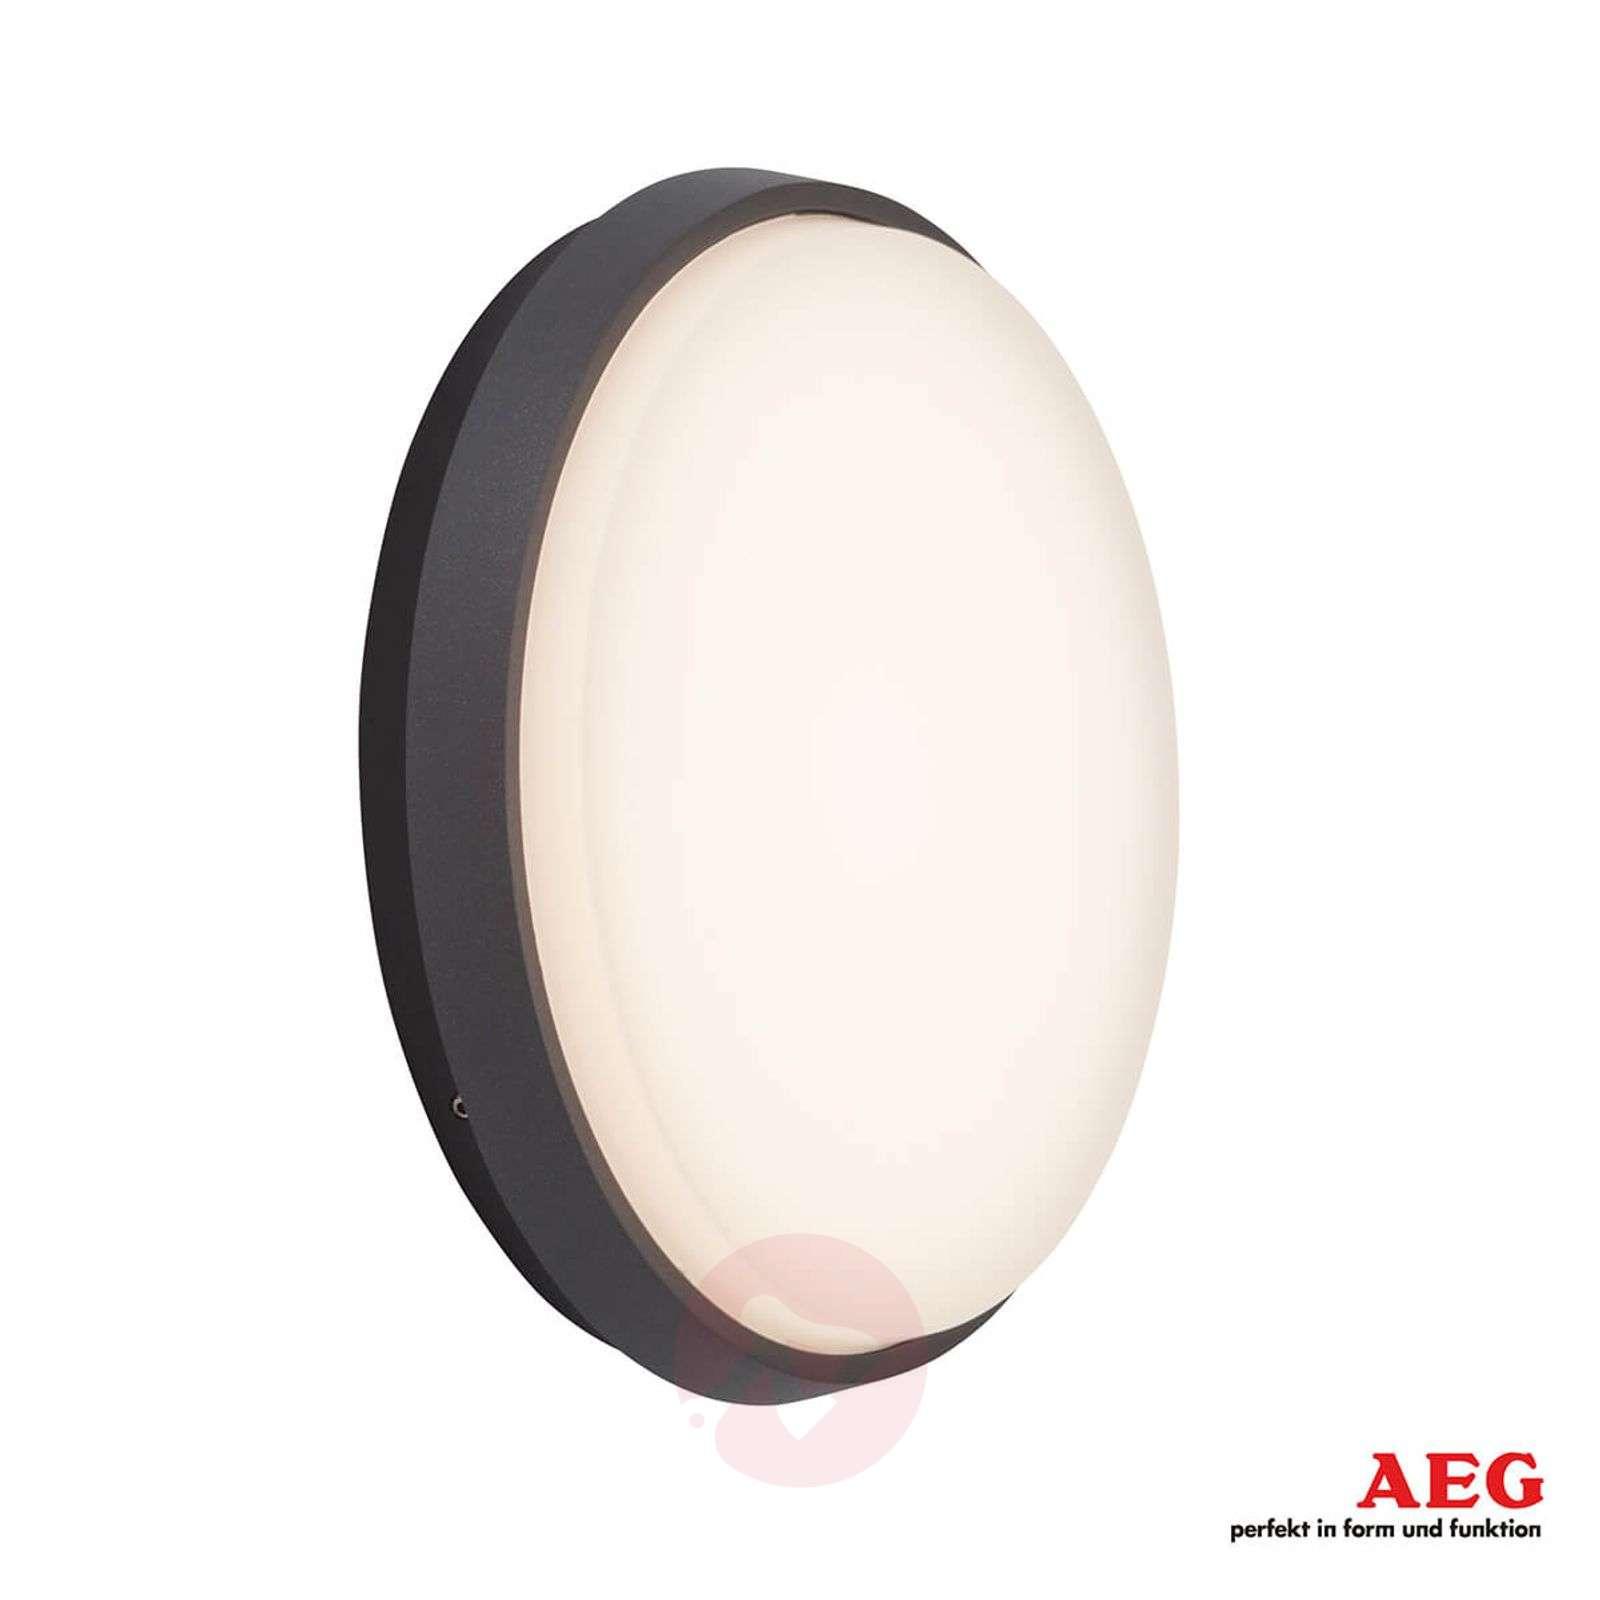 Tehokas LED-ulkoseinälamppu Letan Round-3057120-01